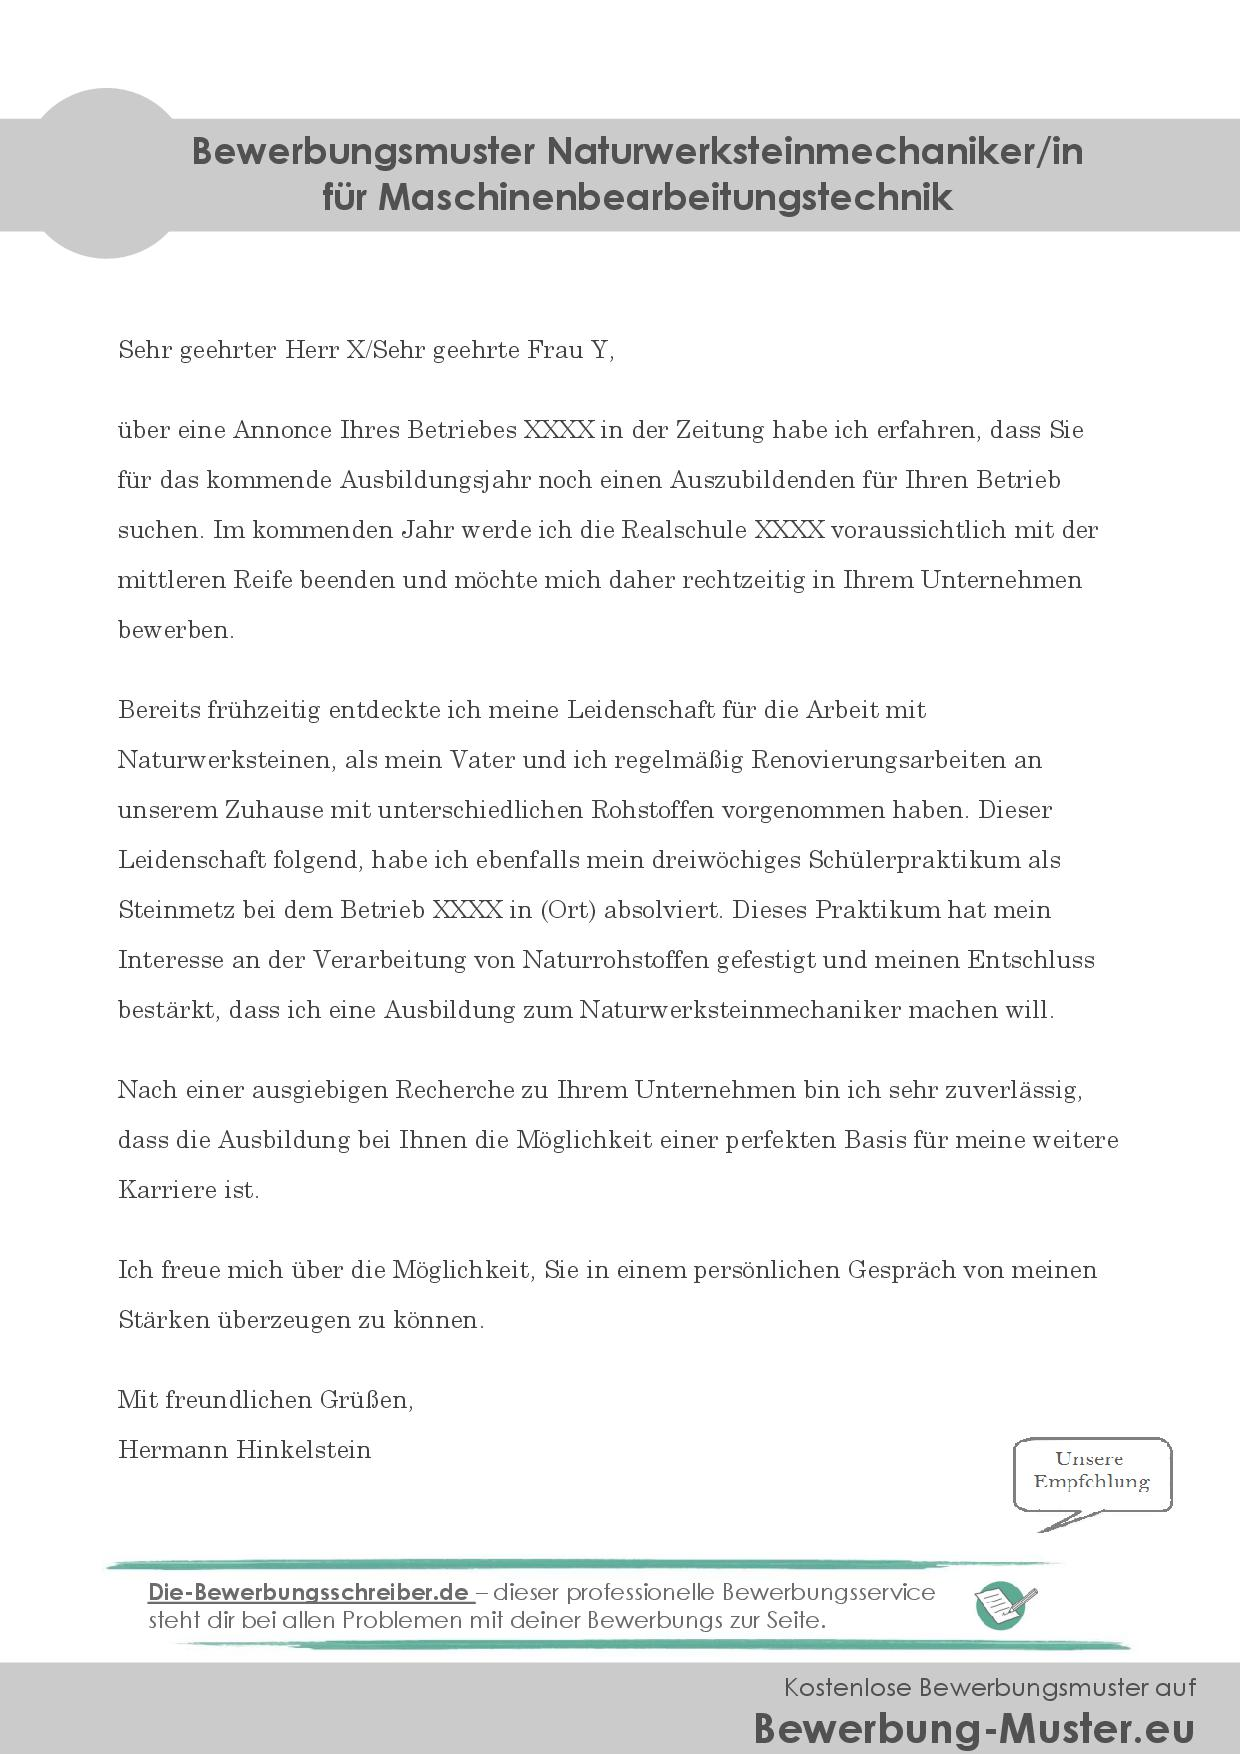 Kostenloses Bewerbungsmuster - Naturwerksteinmechaniker/in